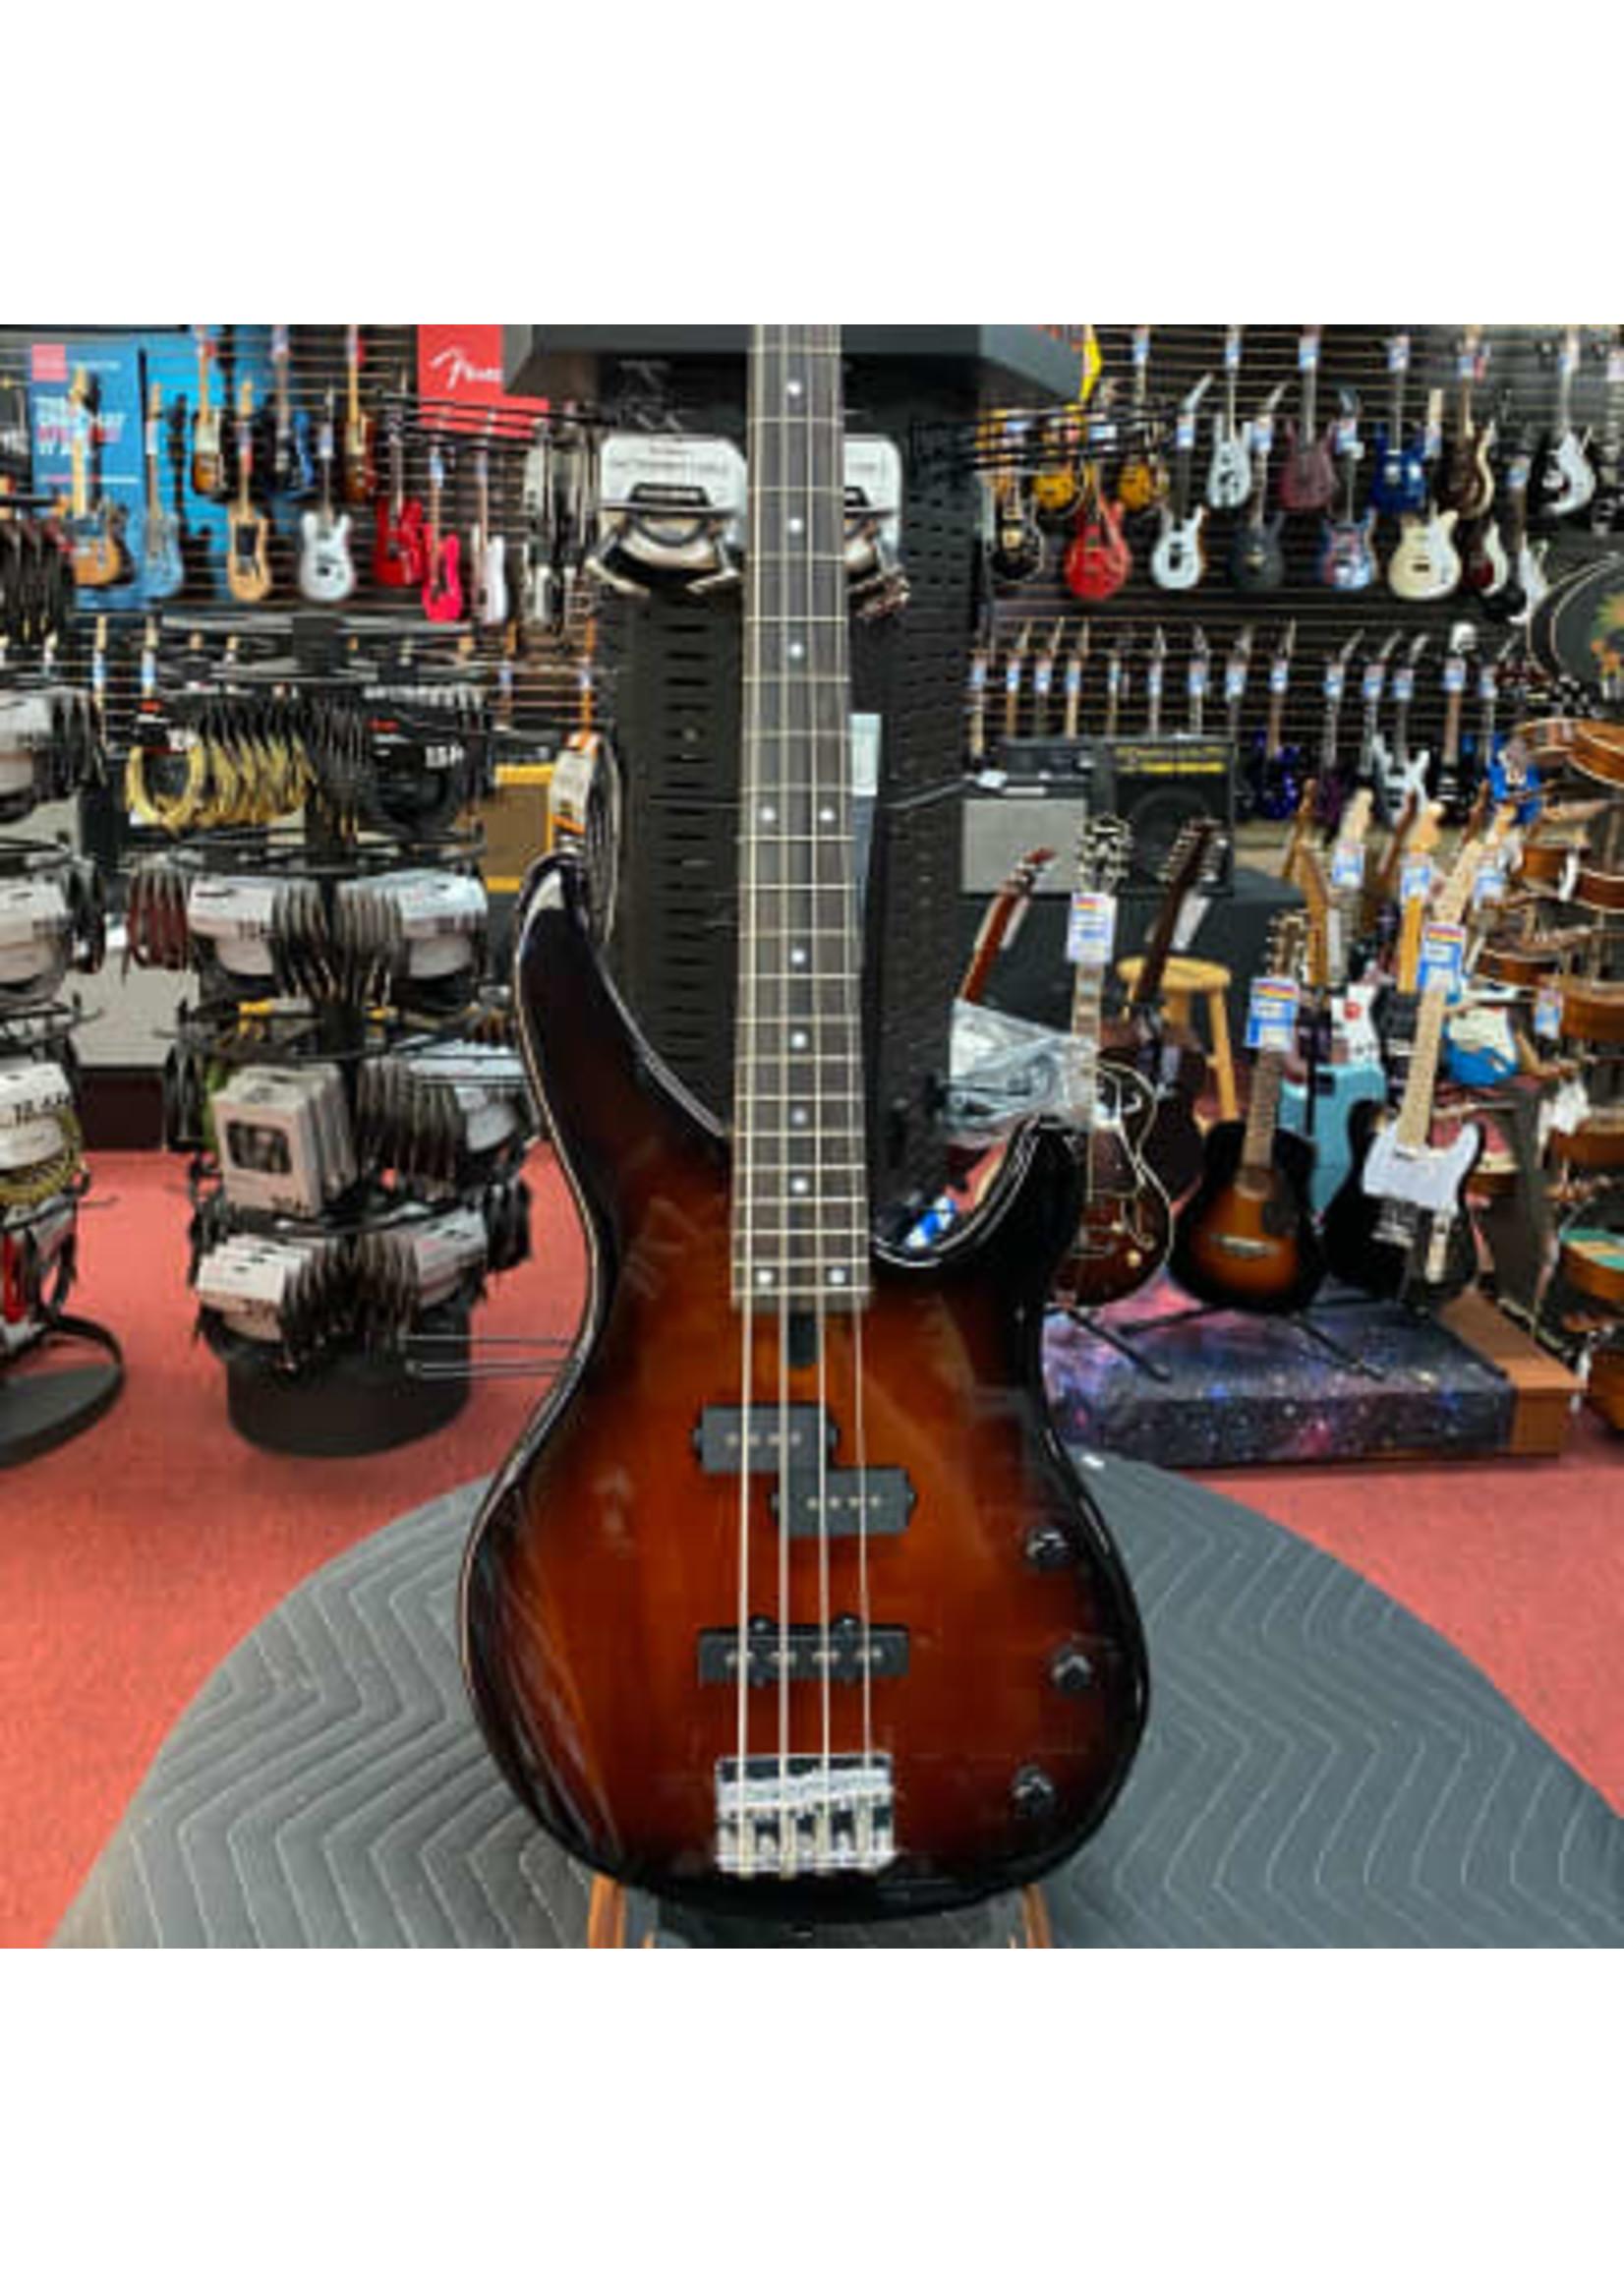 Yamaha Yamaha TRBX174 Bass Guitar - Violin Sunburst